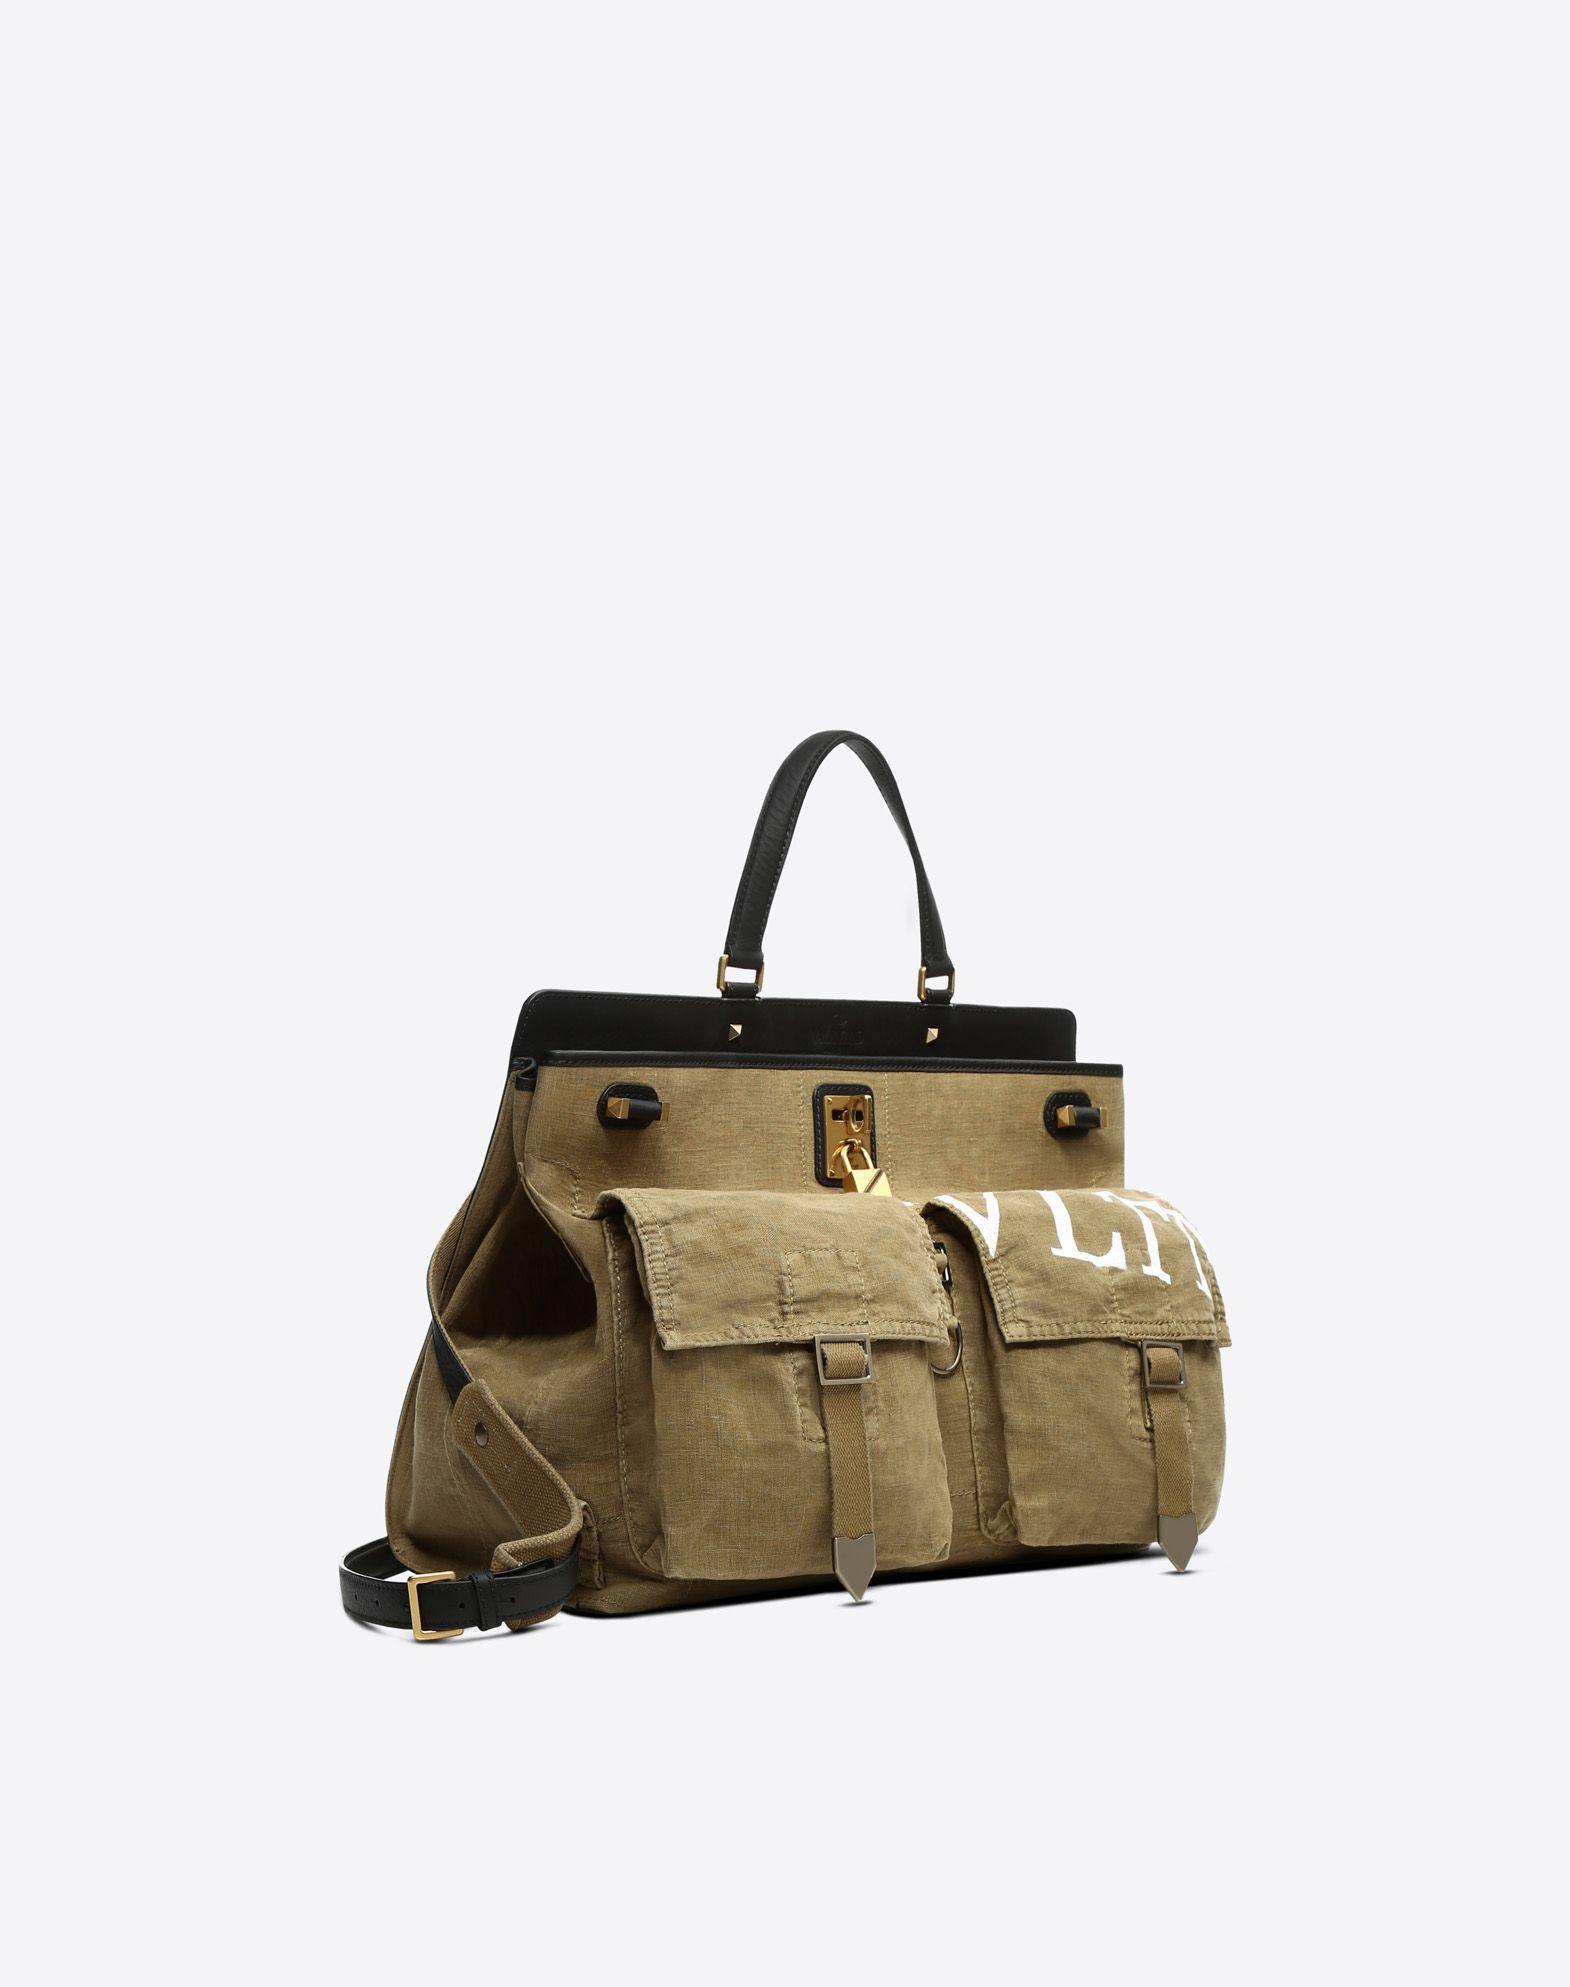 VALENTINO GARAVANI Joylock Maxi Handle Bag HANDBAG D r